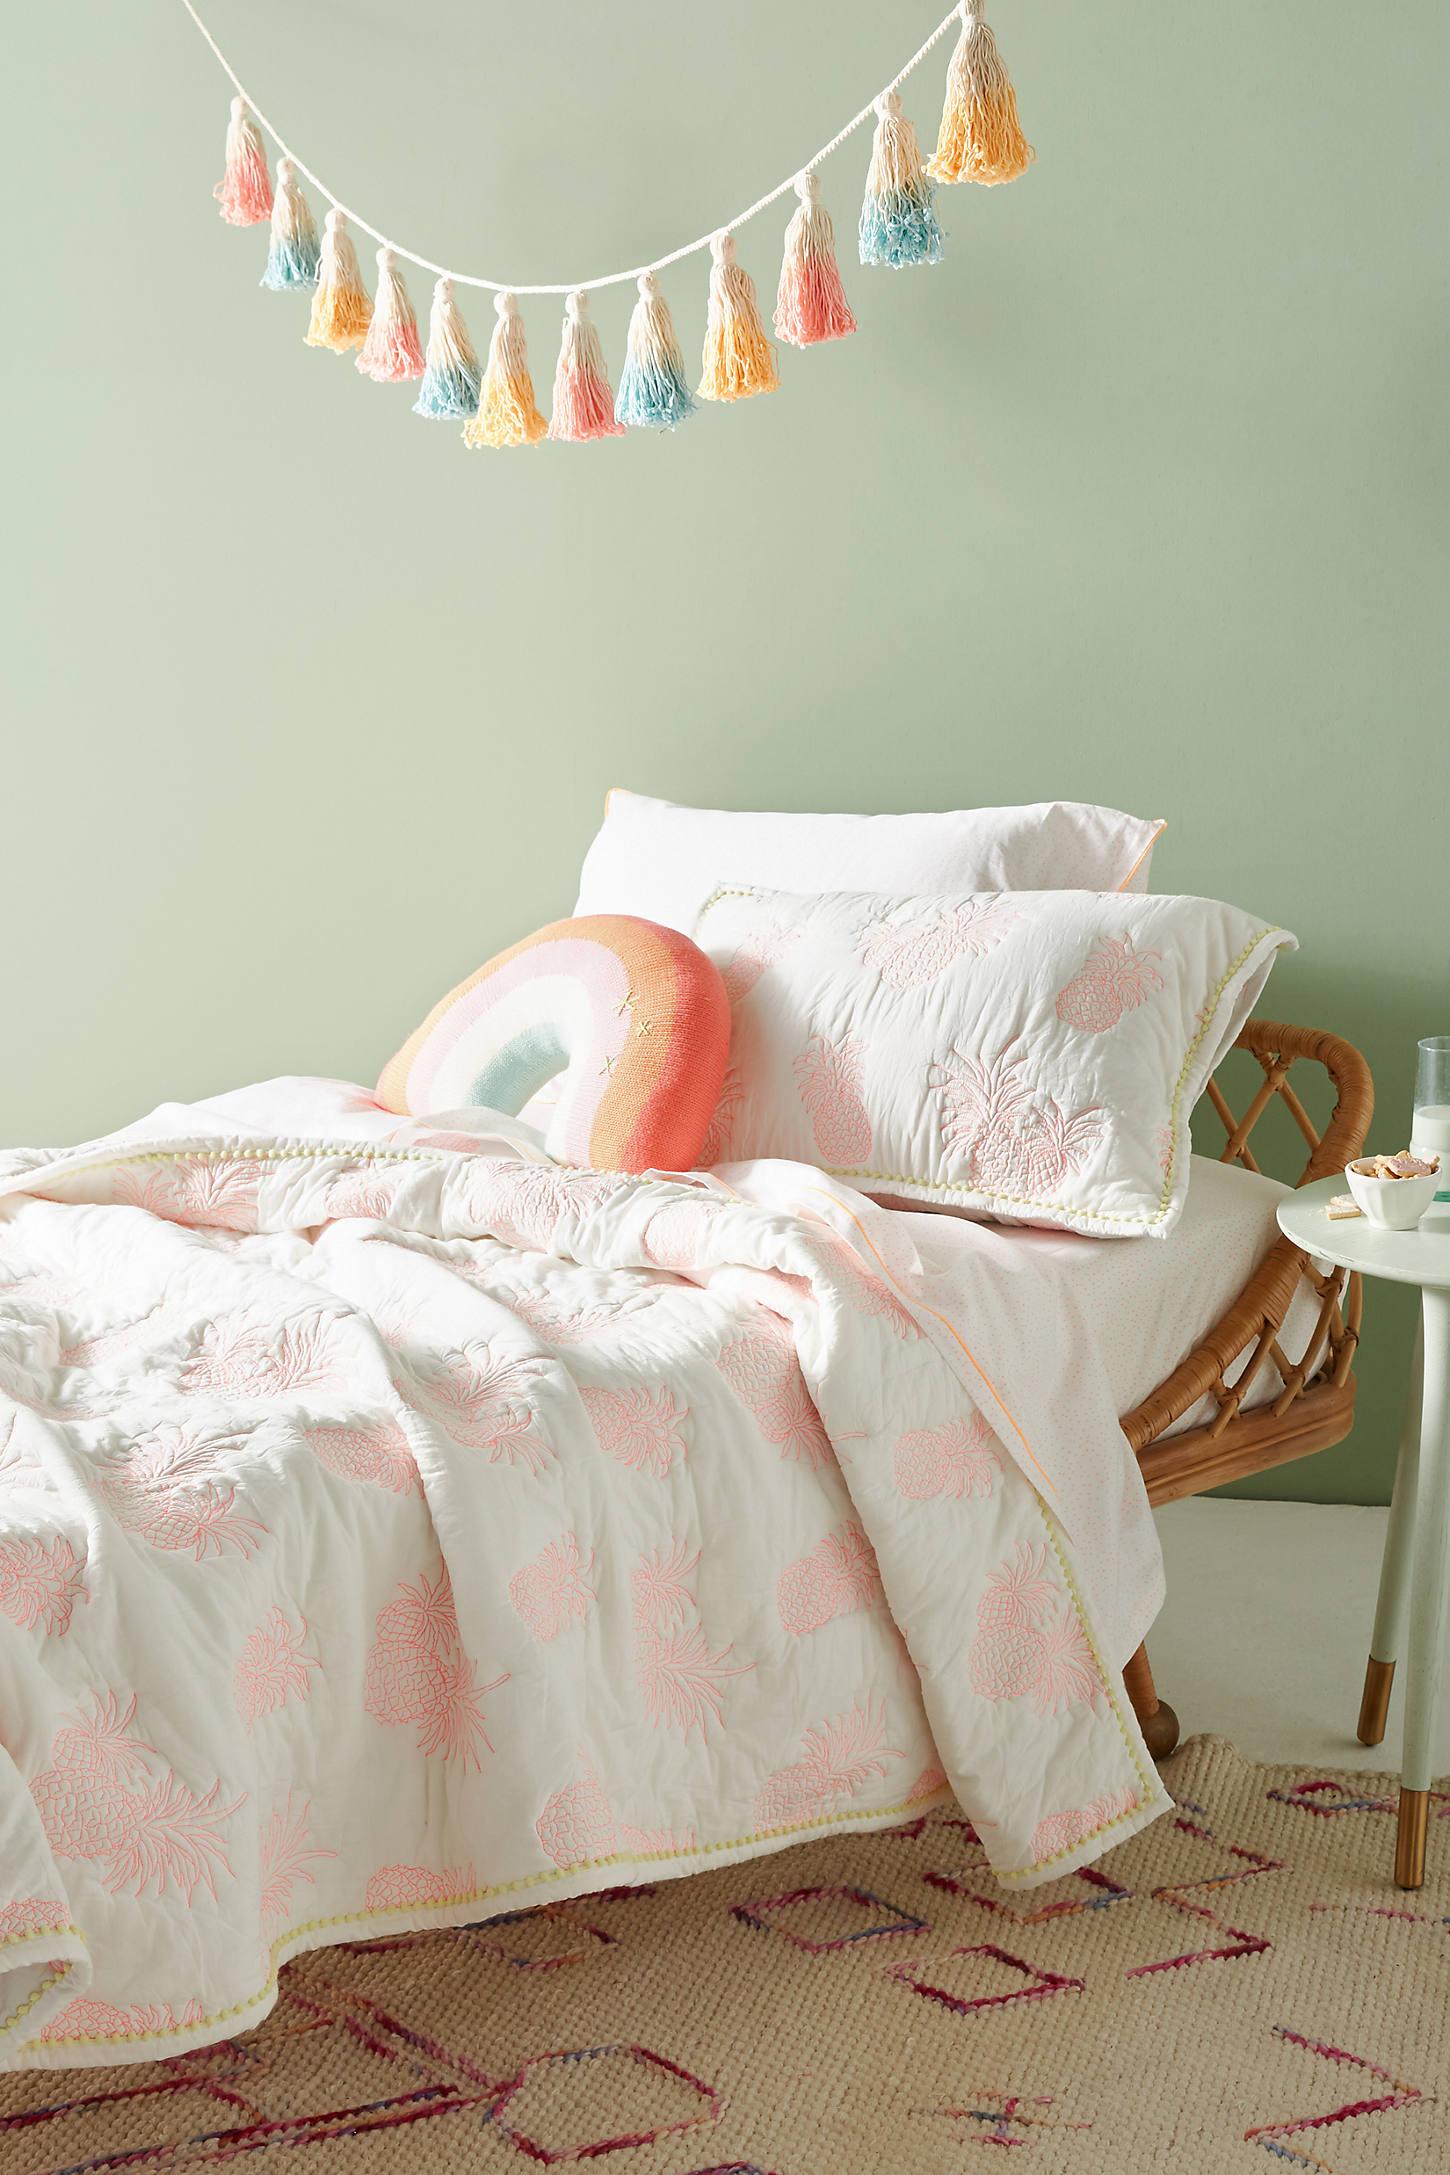 Pineapple Toddler Quilt & Playmat